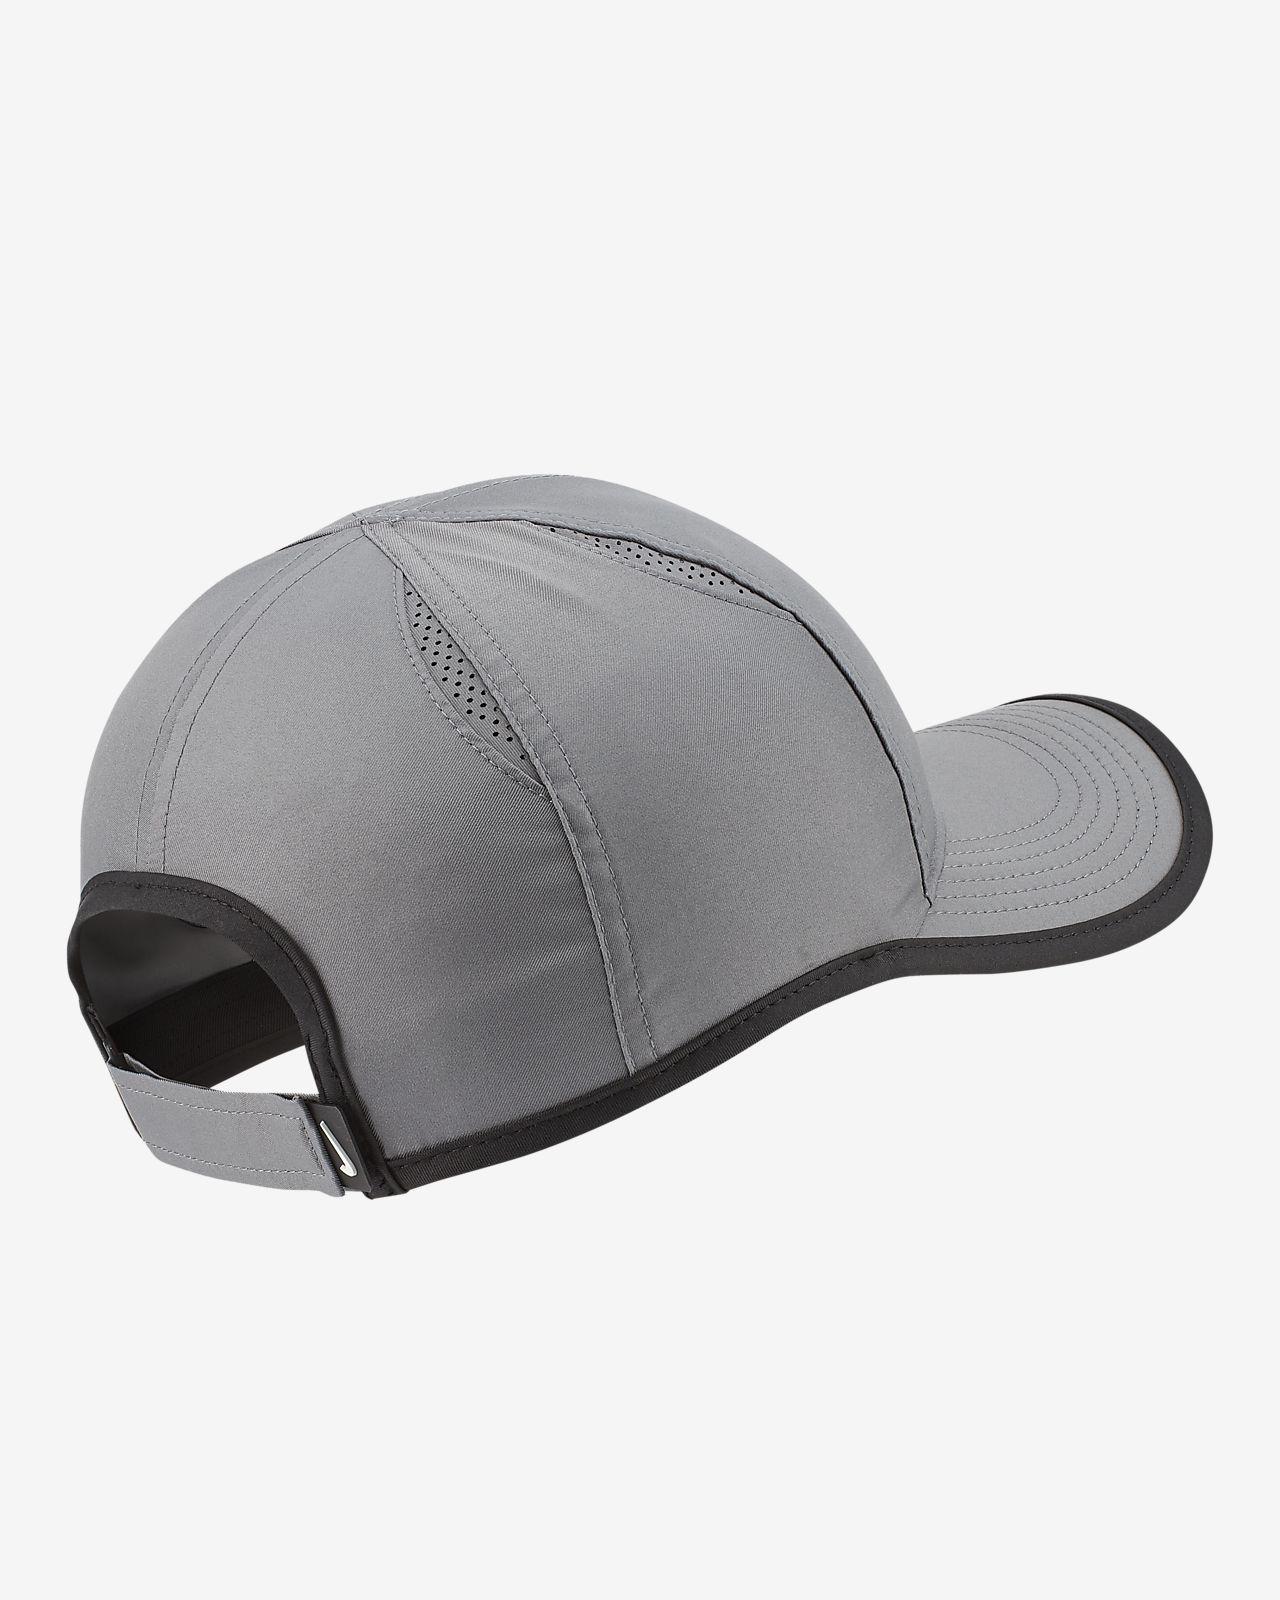 3f9f09cff NikeCourt AeroBill Featherlight Tennis Cap